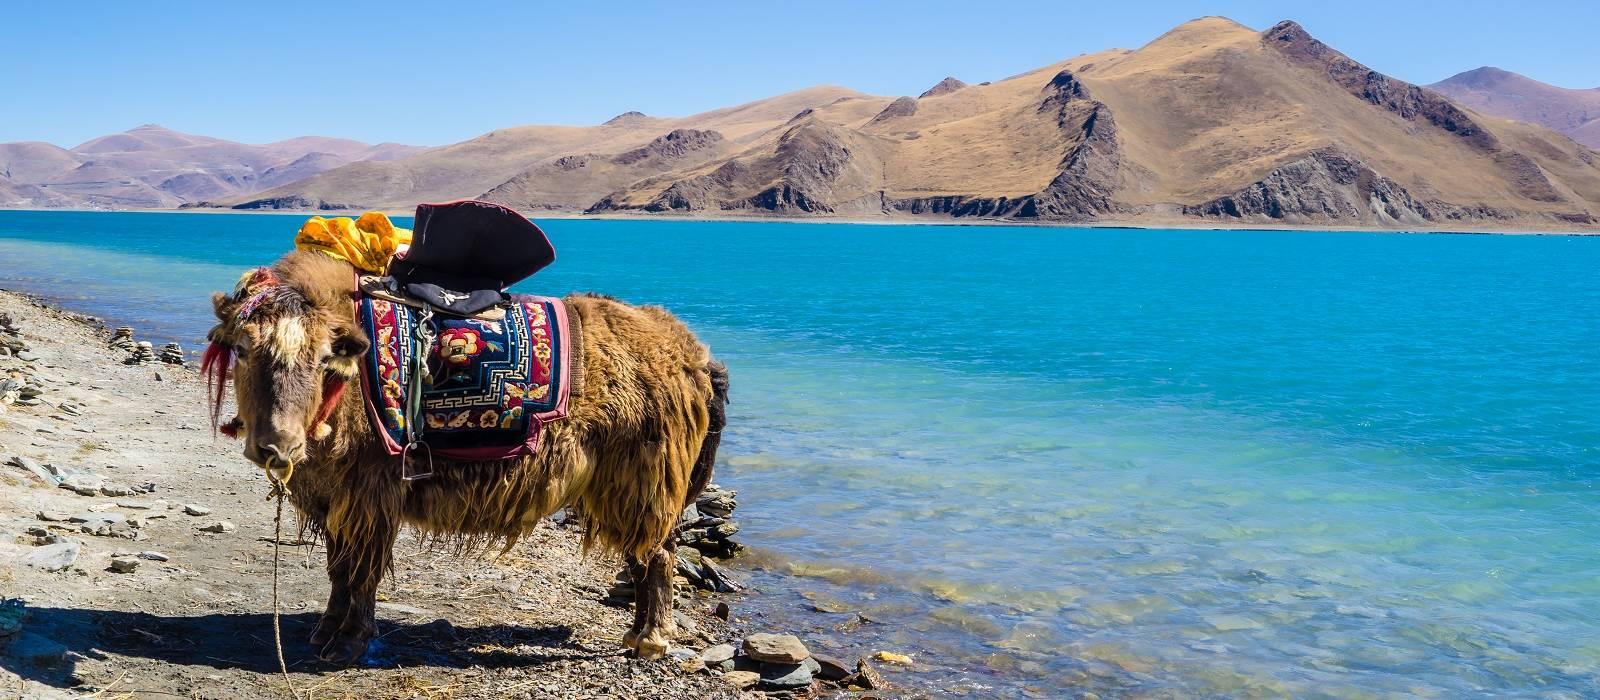 Roof of the World – Kathmandu and Lhasa Tour Trip 1